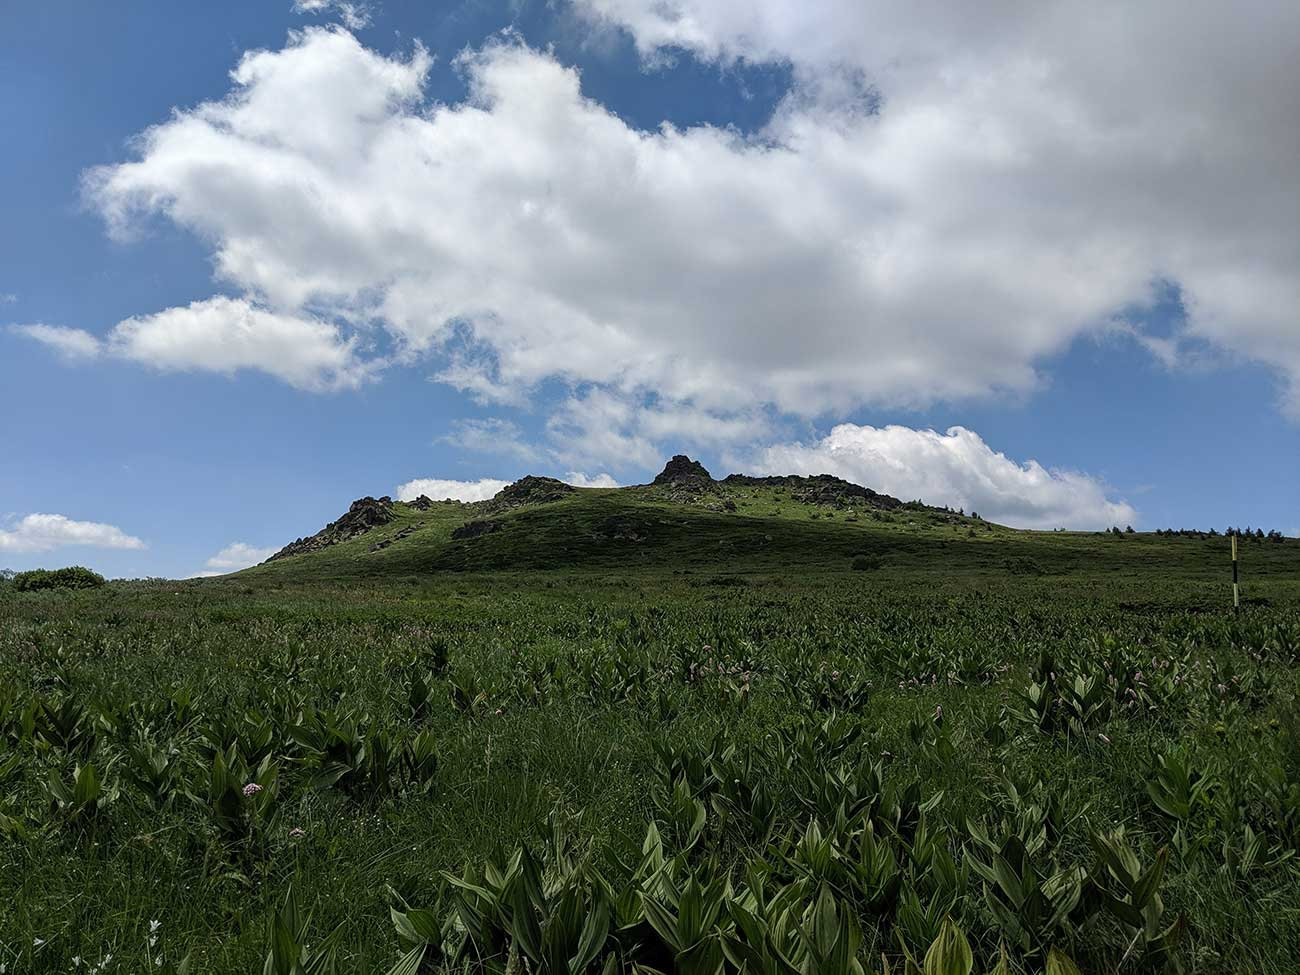 Pretty field and mountain top on Vitosha Mountain in Bulgaria